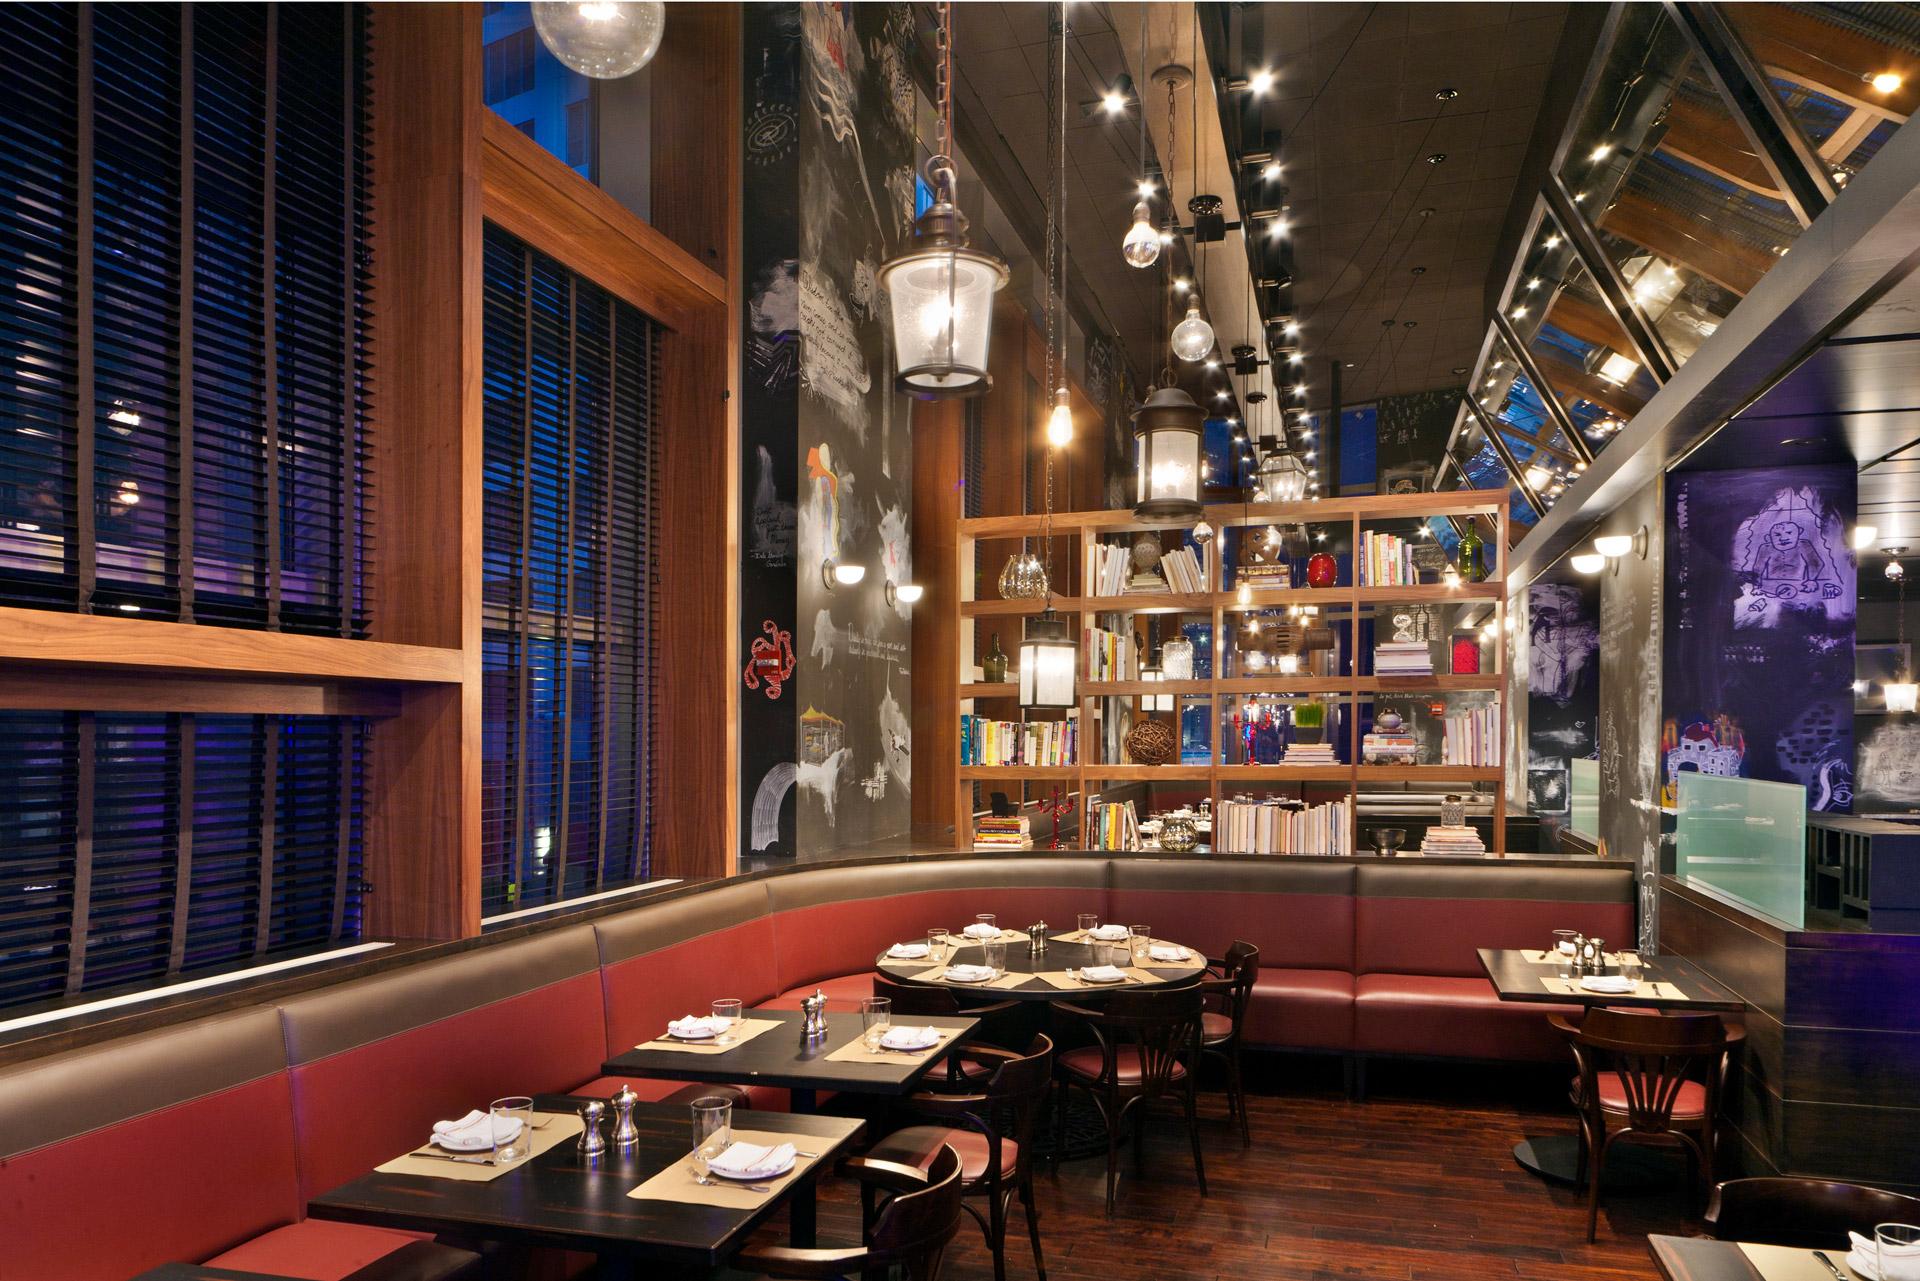 BLT Bar & Grill restaurant design